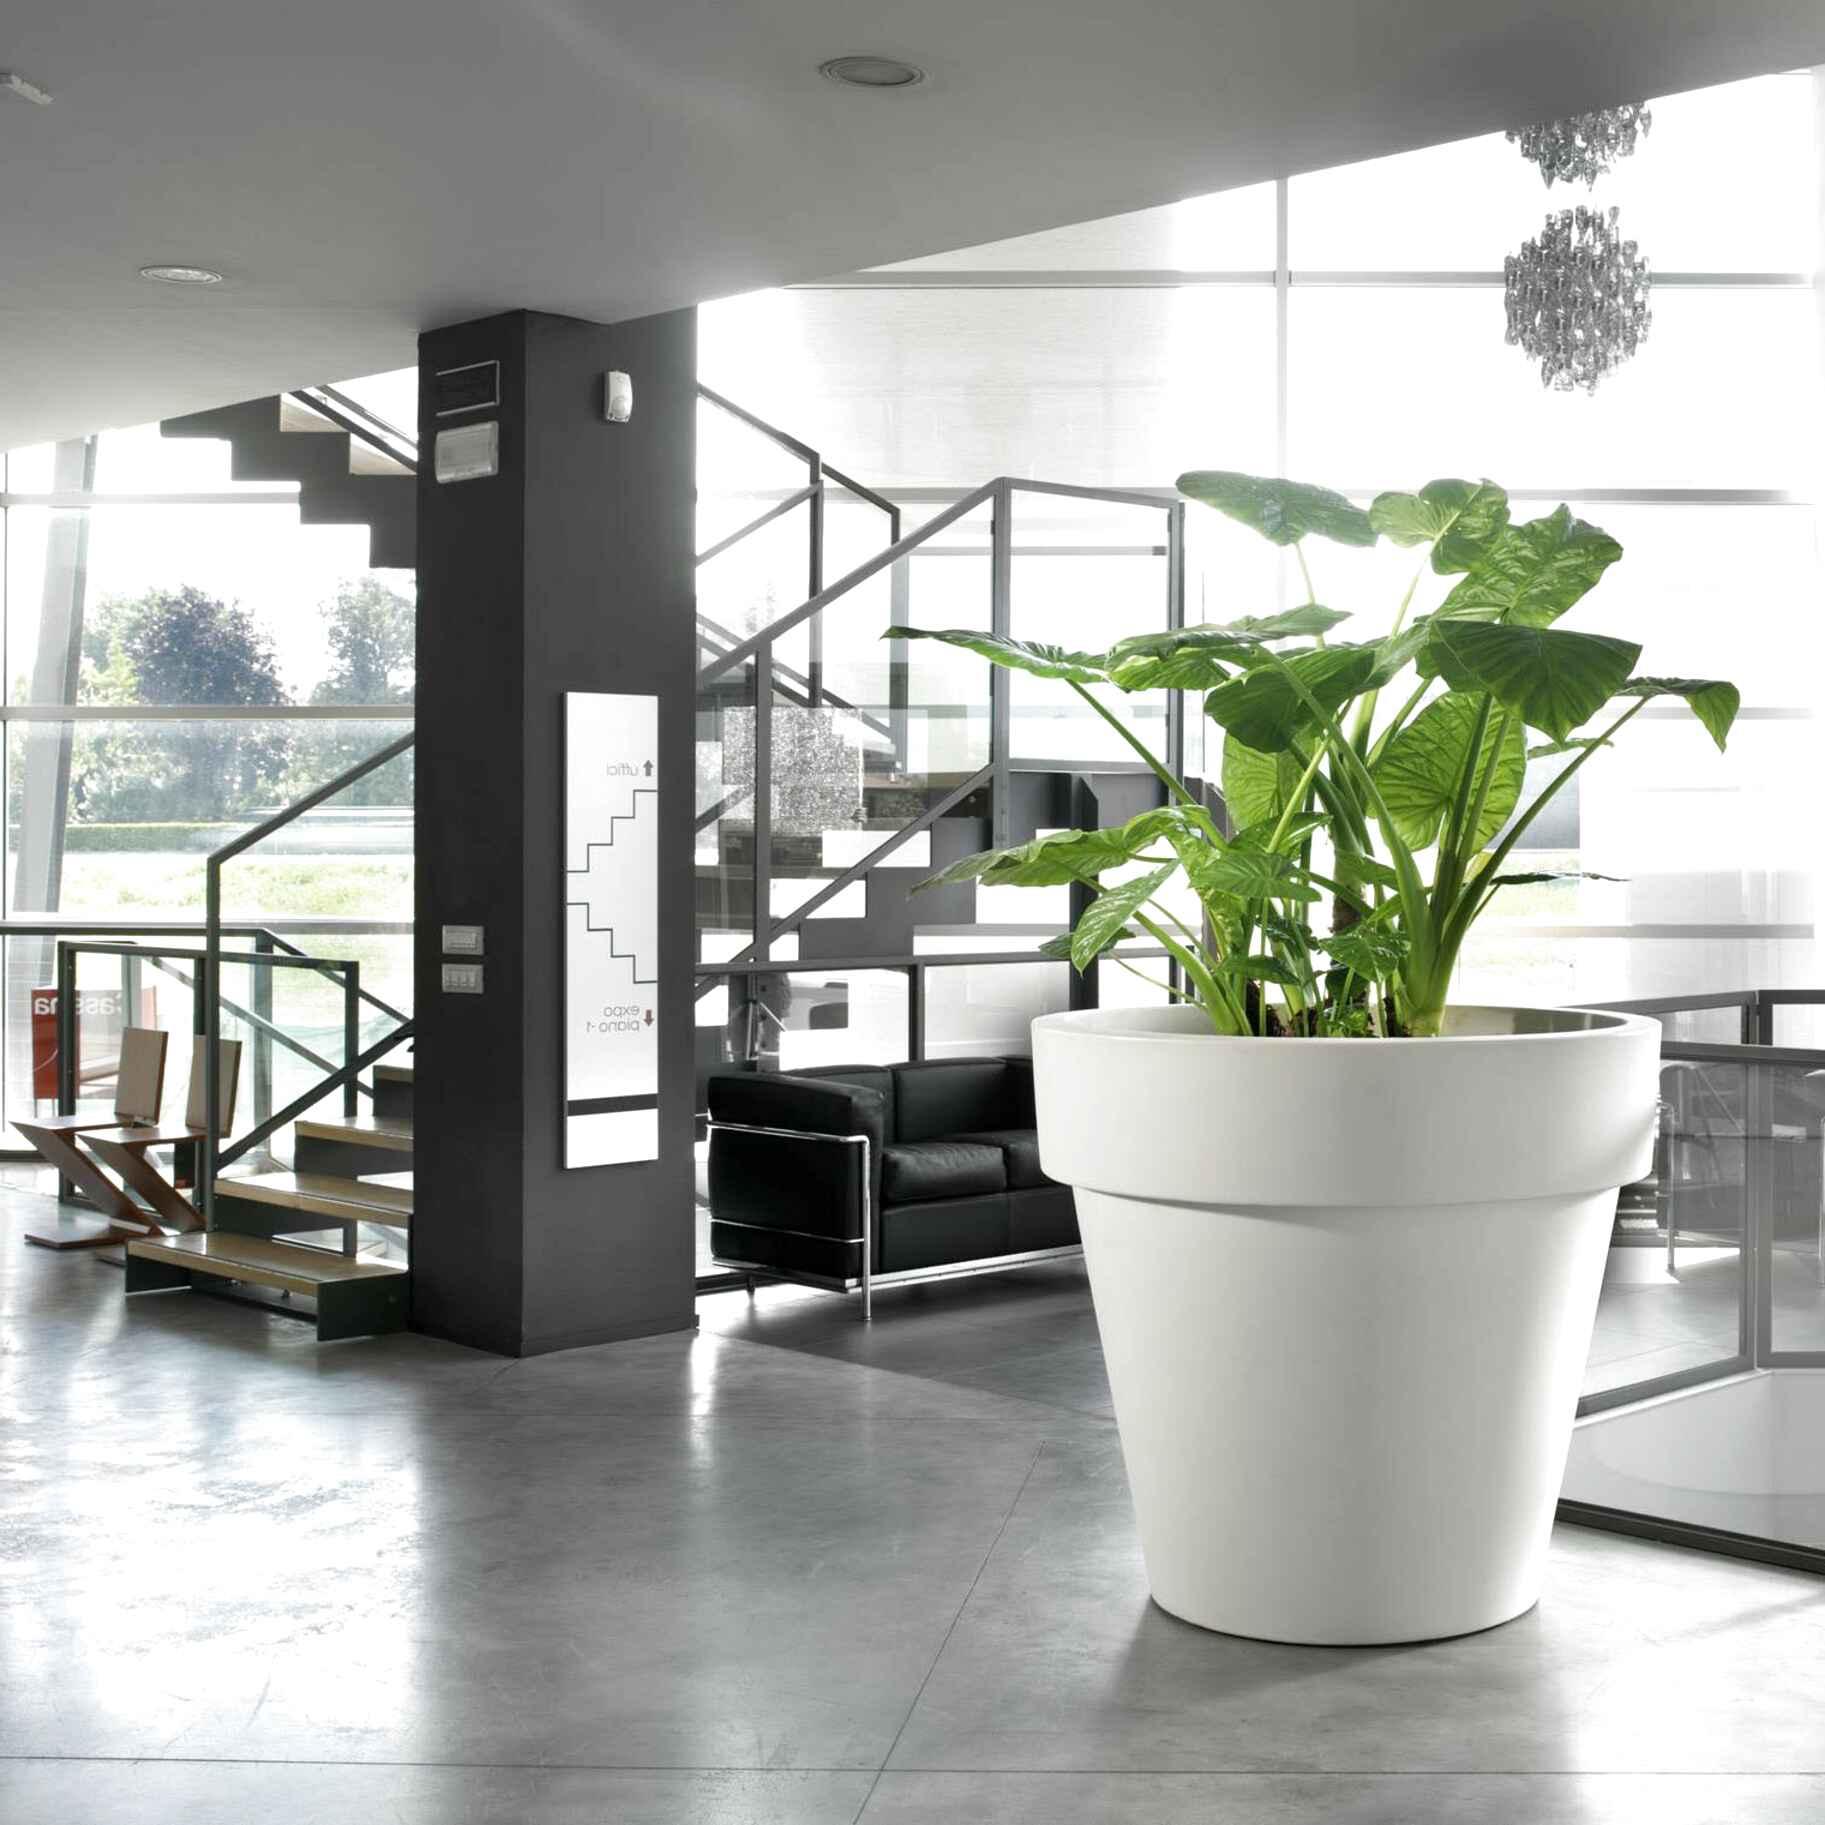 Vasi Per Piante Da Terrazzo vasi giardino grandi usato in italia | vedi tutte i 50 prezzi!